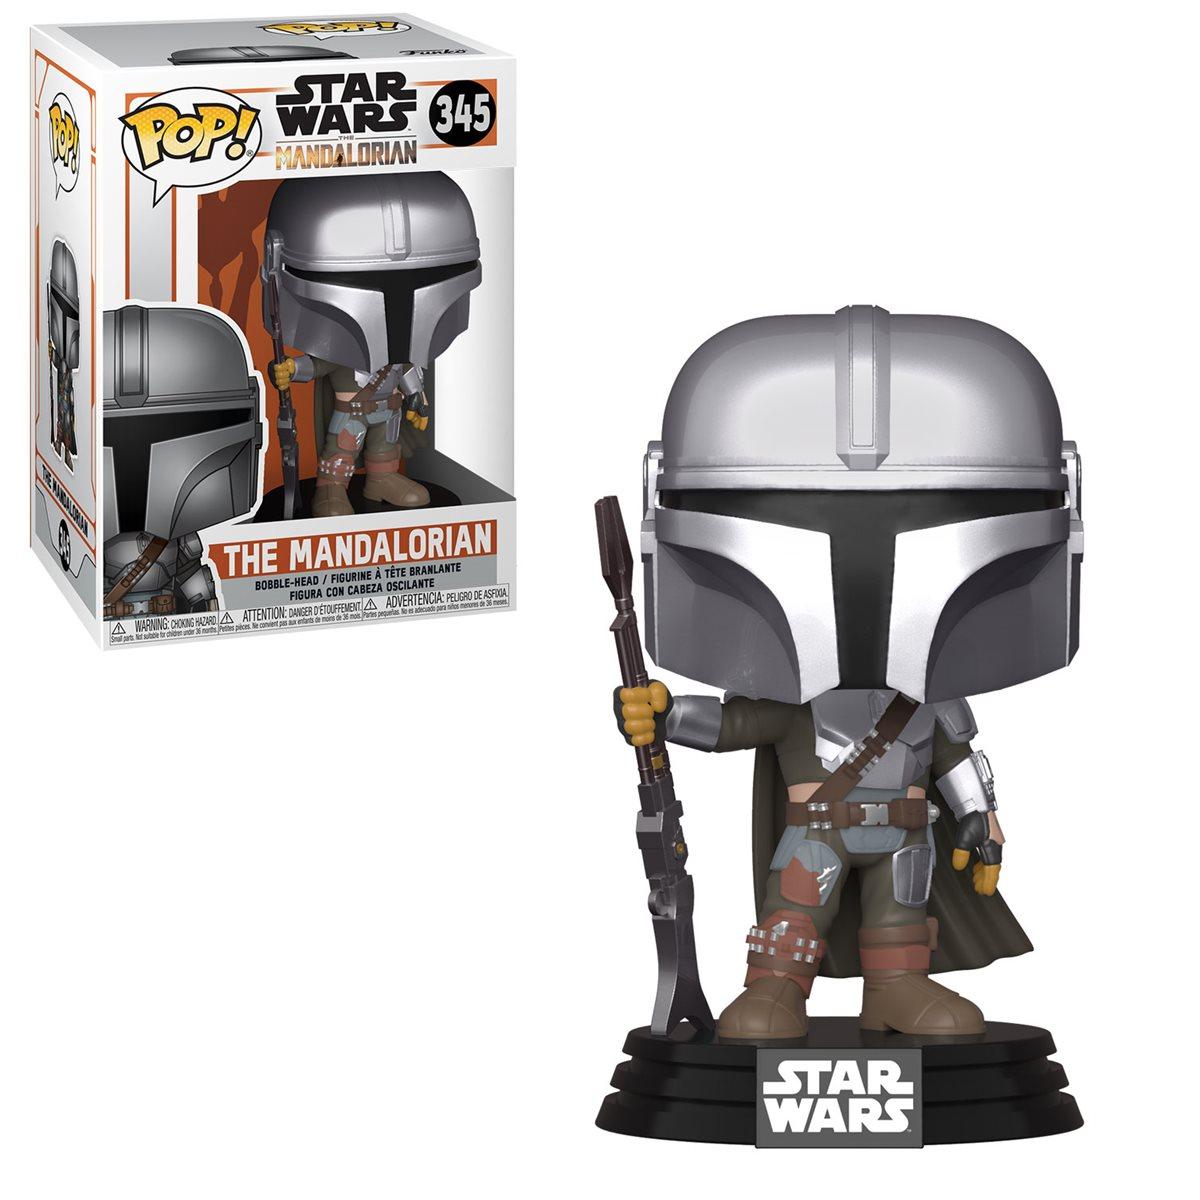 Star Wars The Mandalorian Vinyl Figures IN Stock Funko Pop